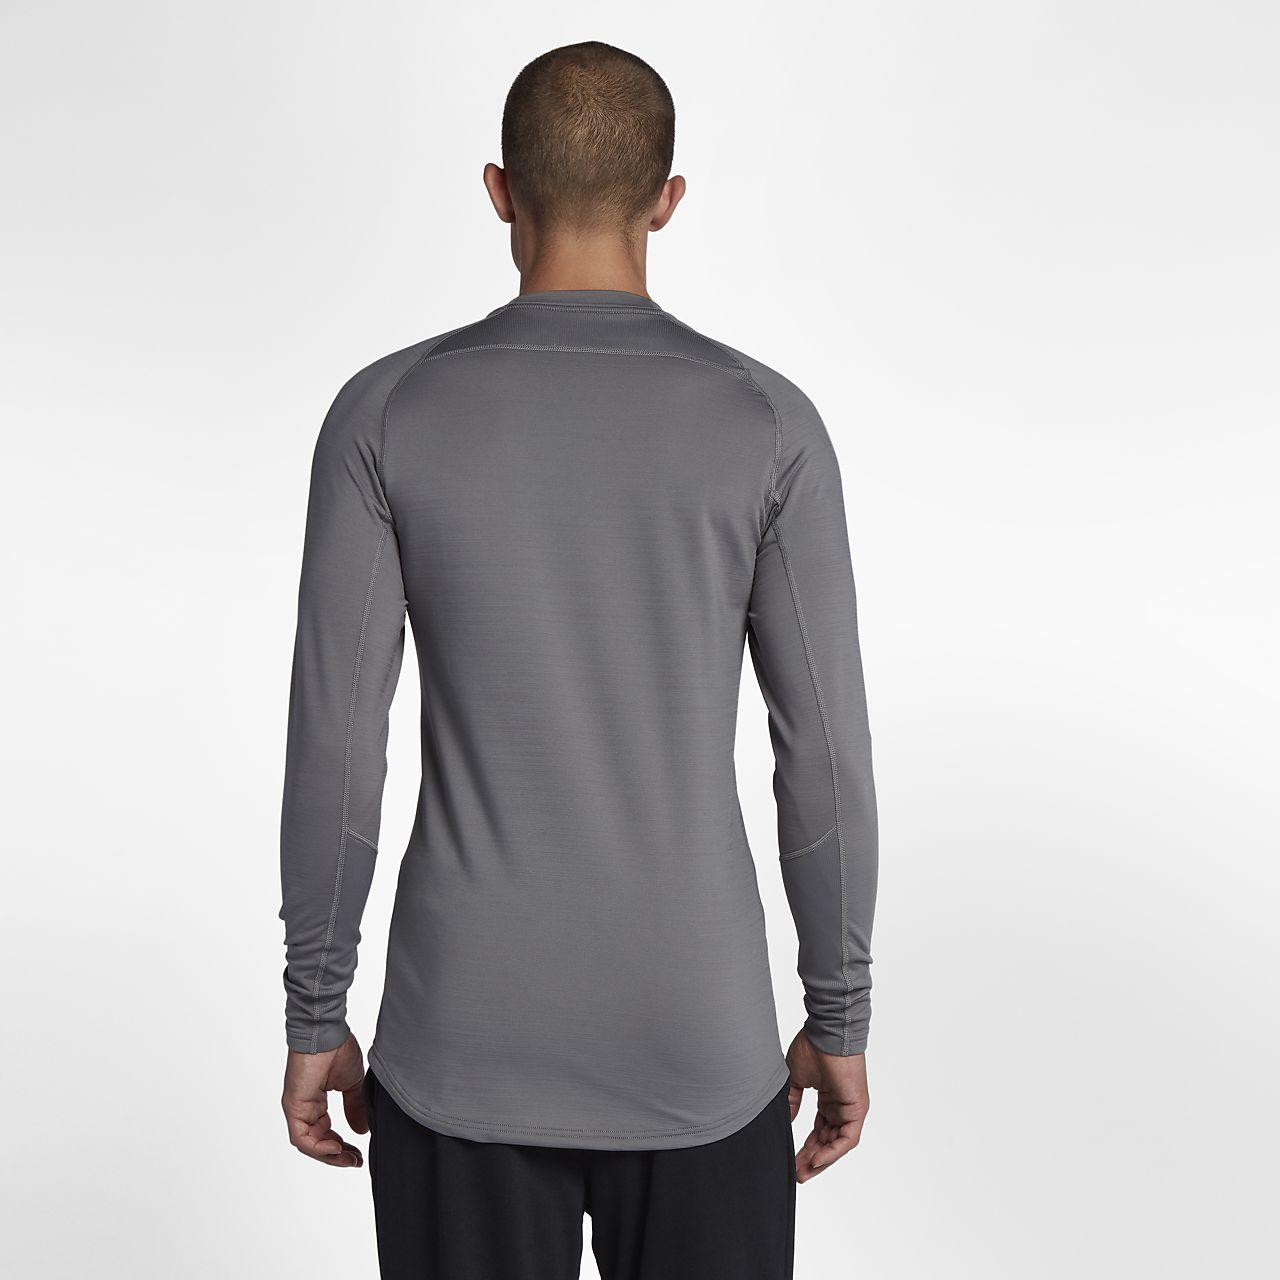 53ac945d4 Nike Pro Warm Camiseta de entrenamiento de manga larga - Hombre ...